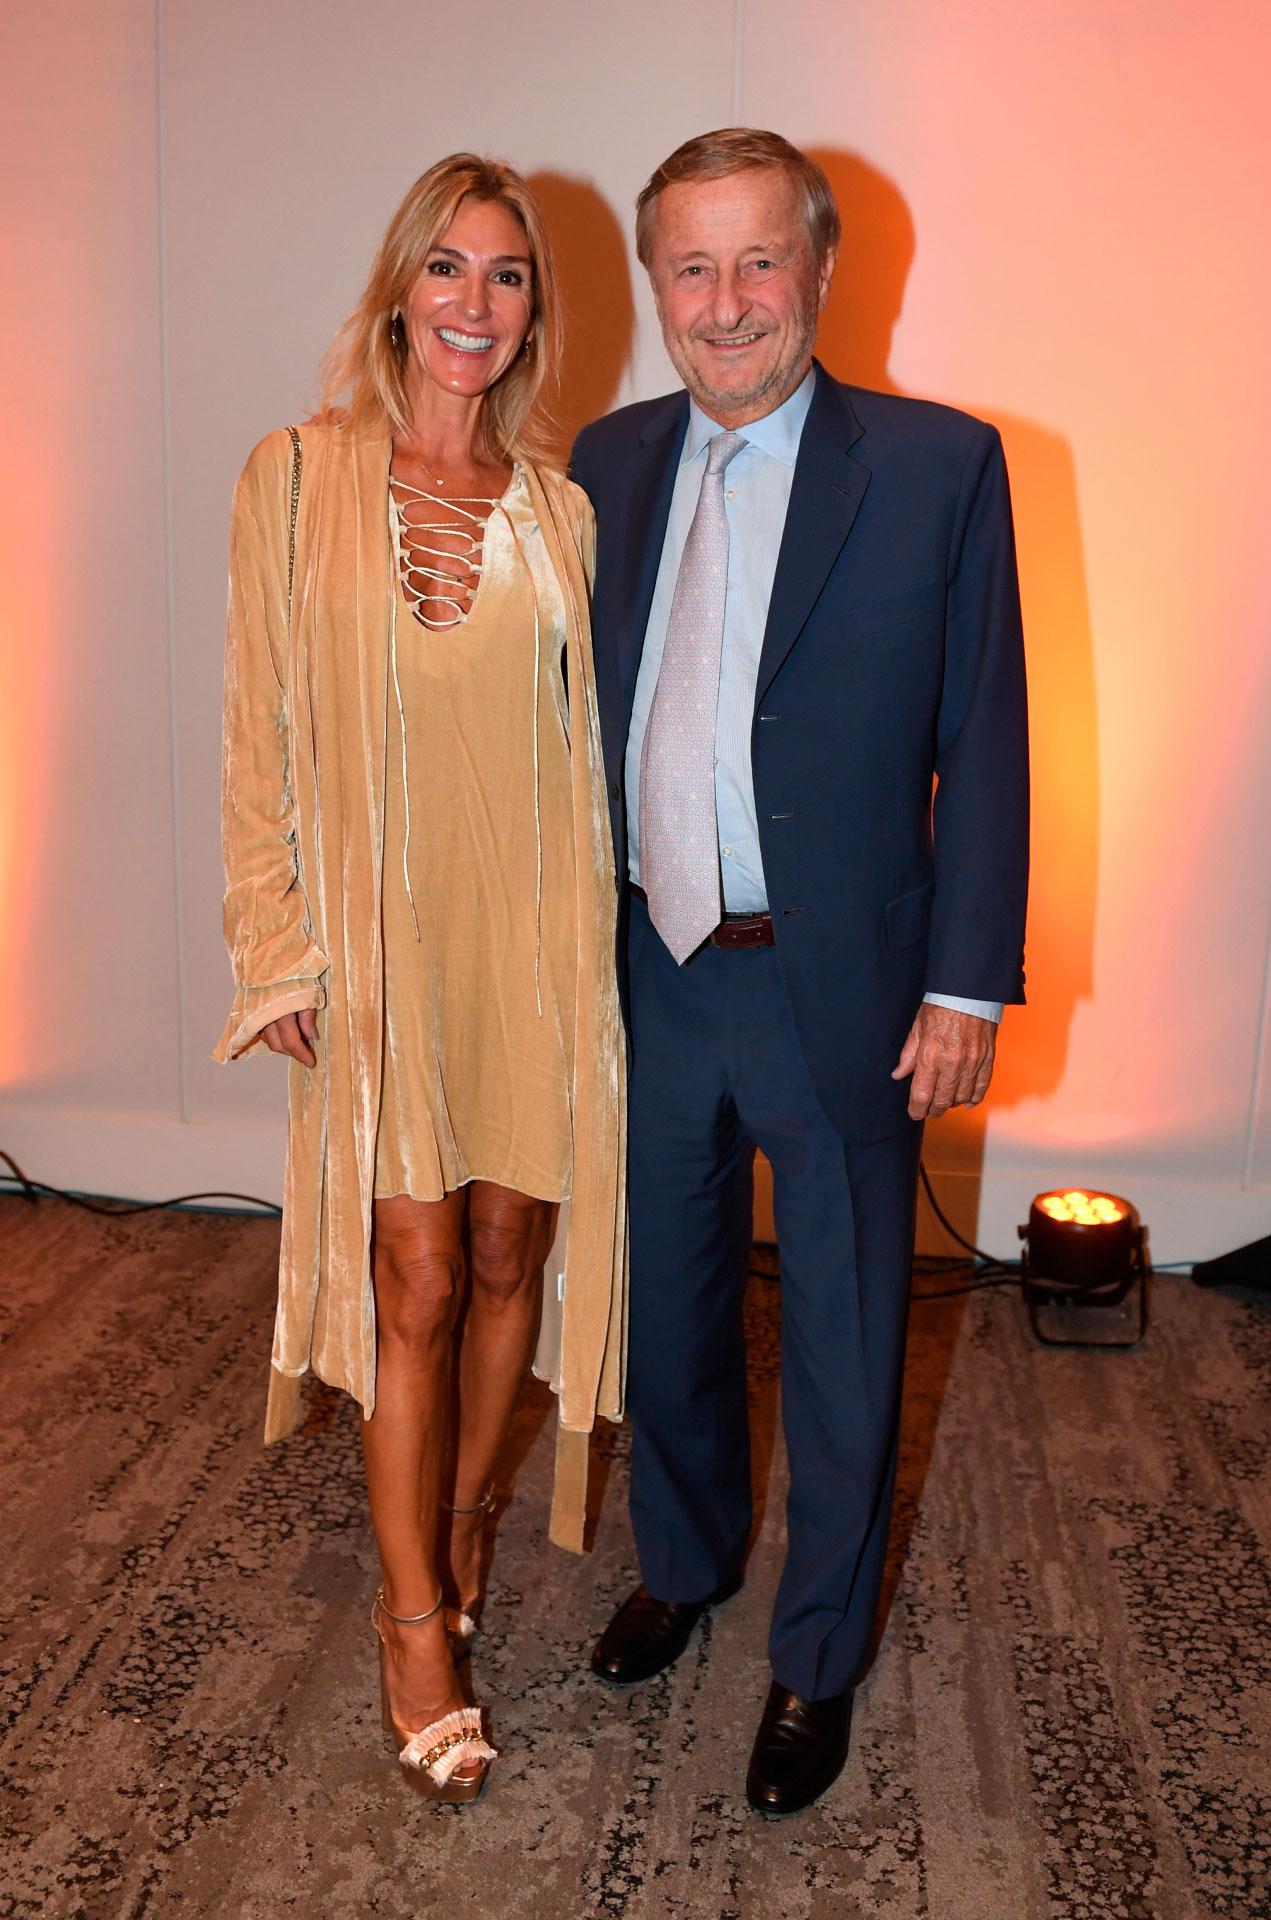 El presidente de Fiat Argentina, Cristiano Rattazzi, y su mujer, Gabriela Castellani